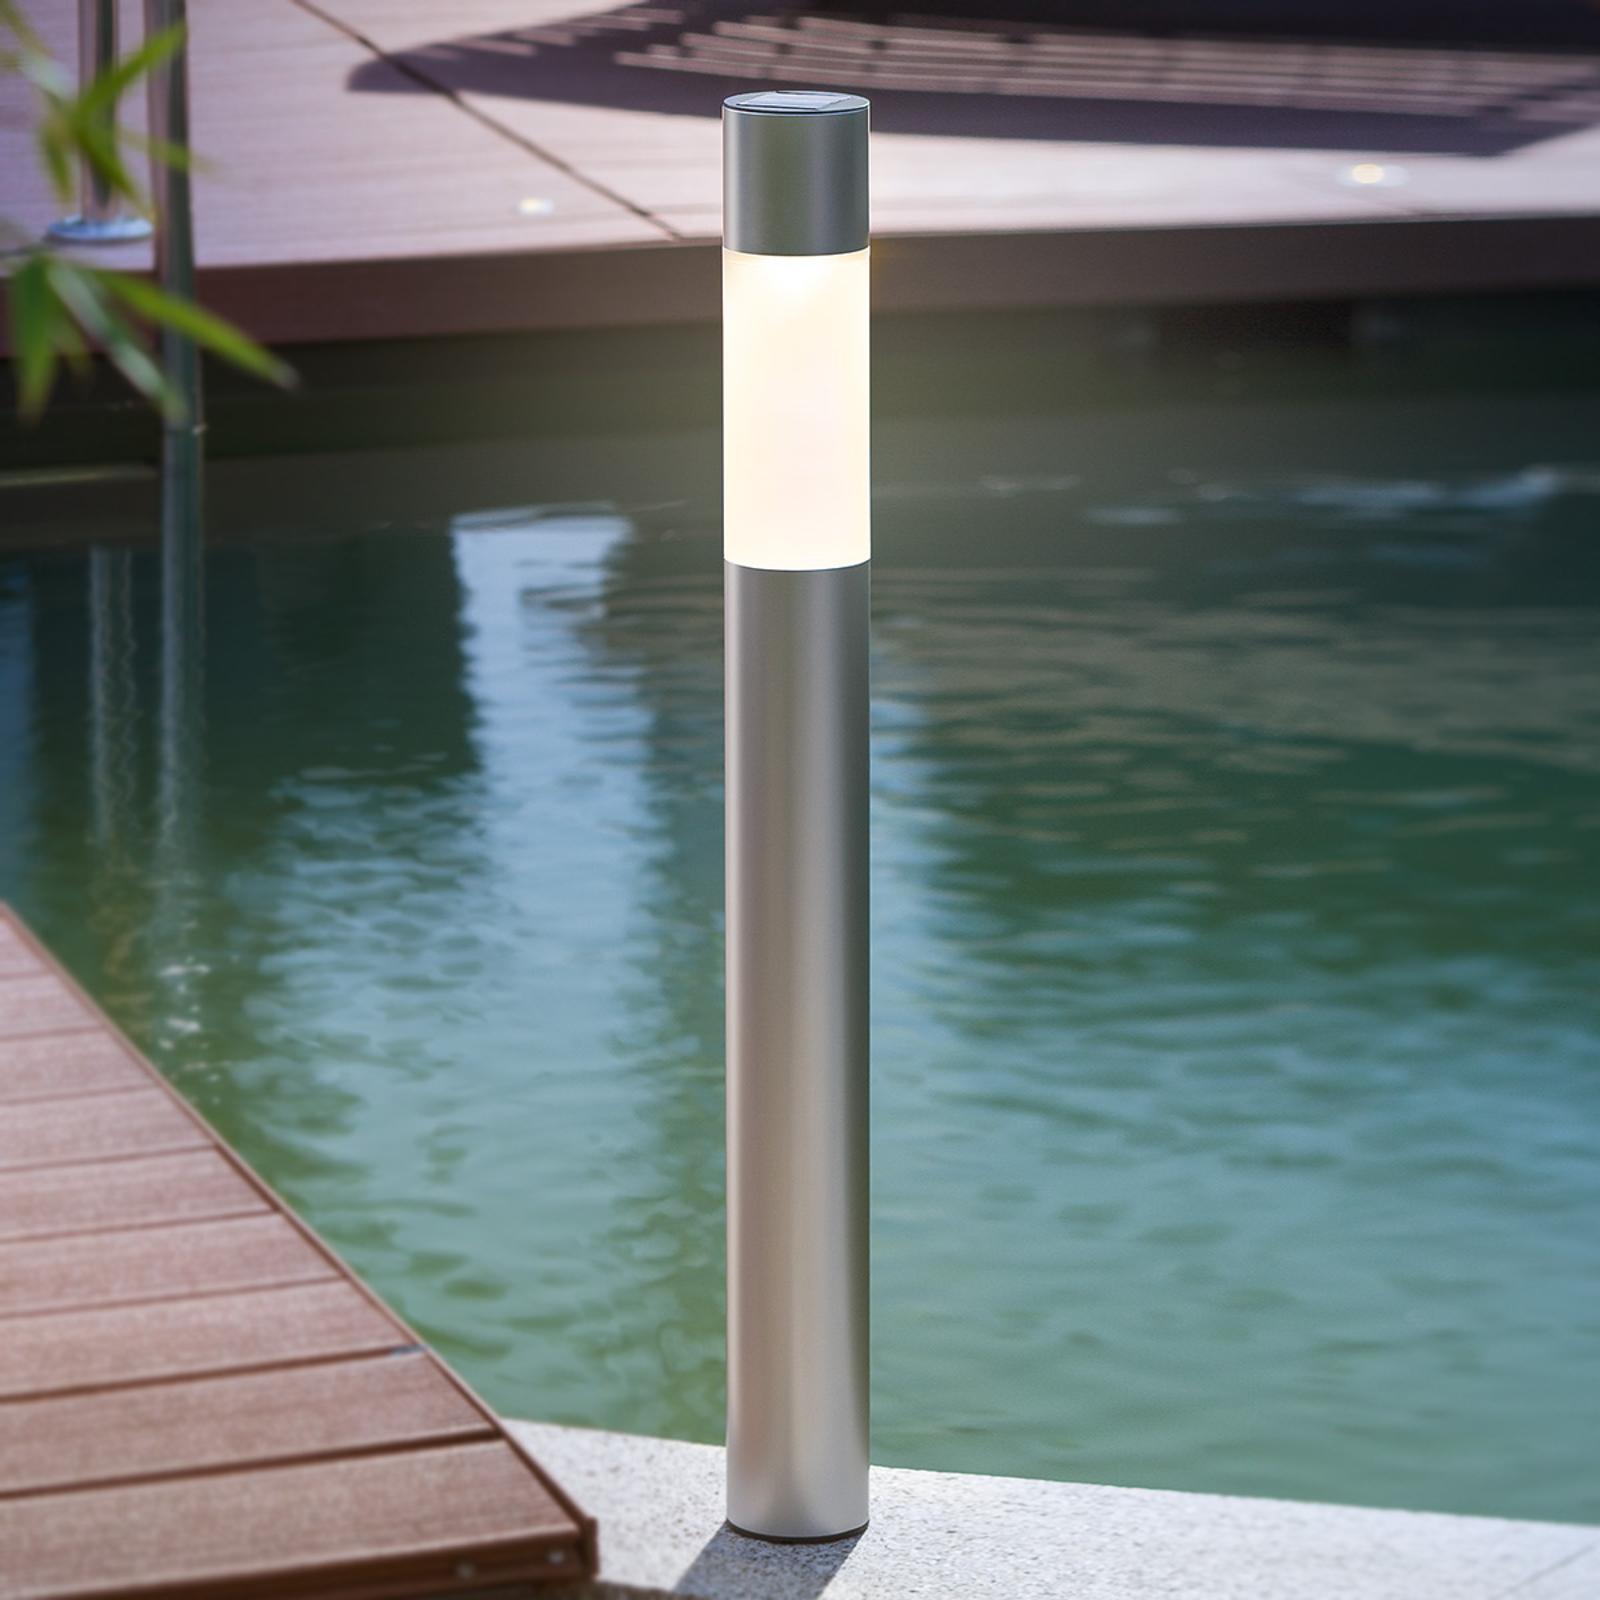 Modern LED solar lamp Pole Light_3012232_1